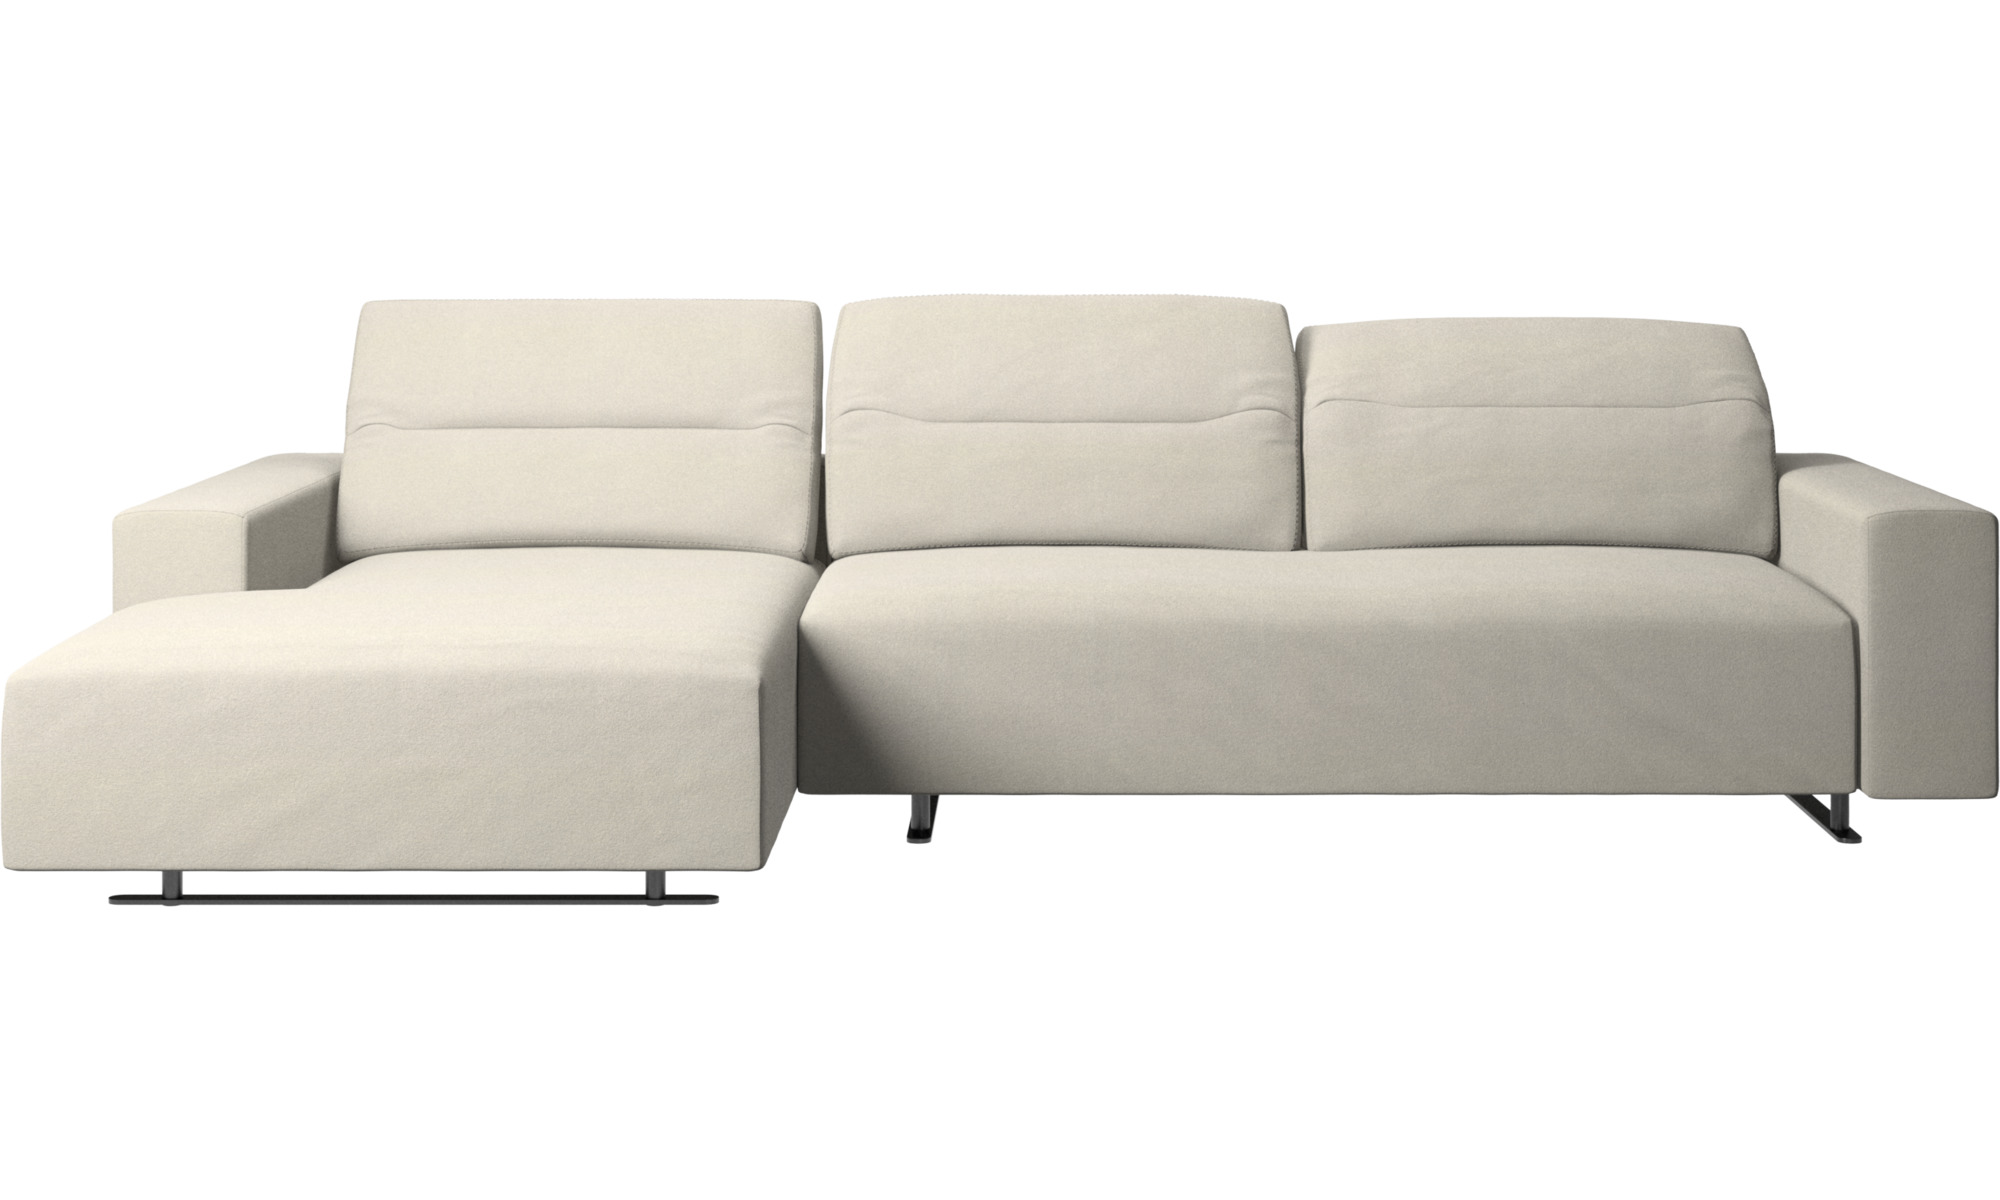 Sofaer med chaiselong - Hampton sofa med justerbar ryg og lounge modul venstre side - Hvid - Stof